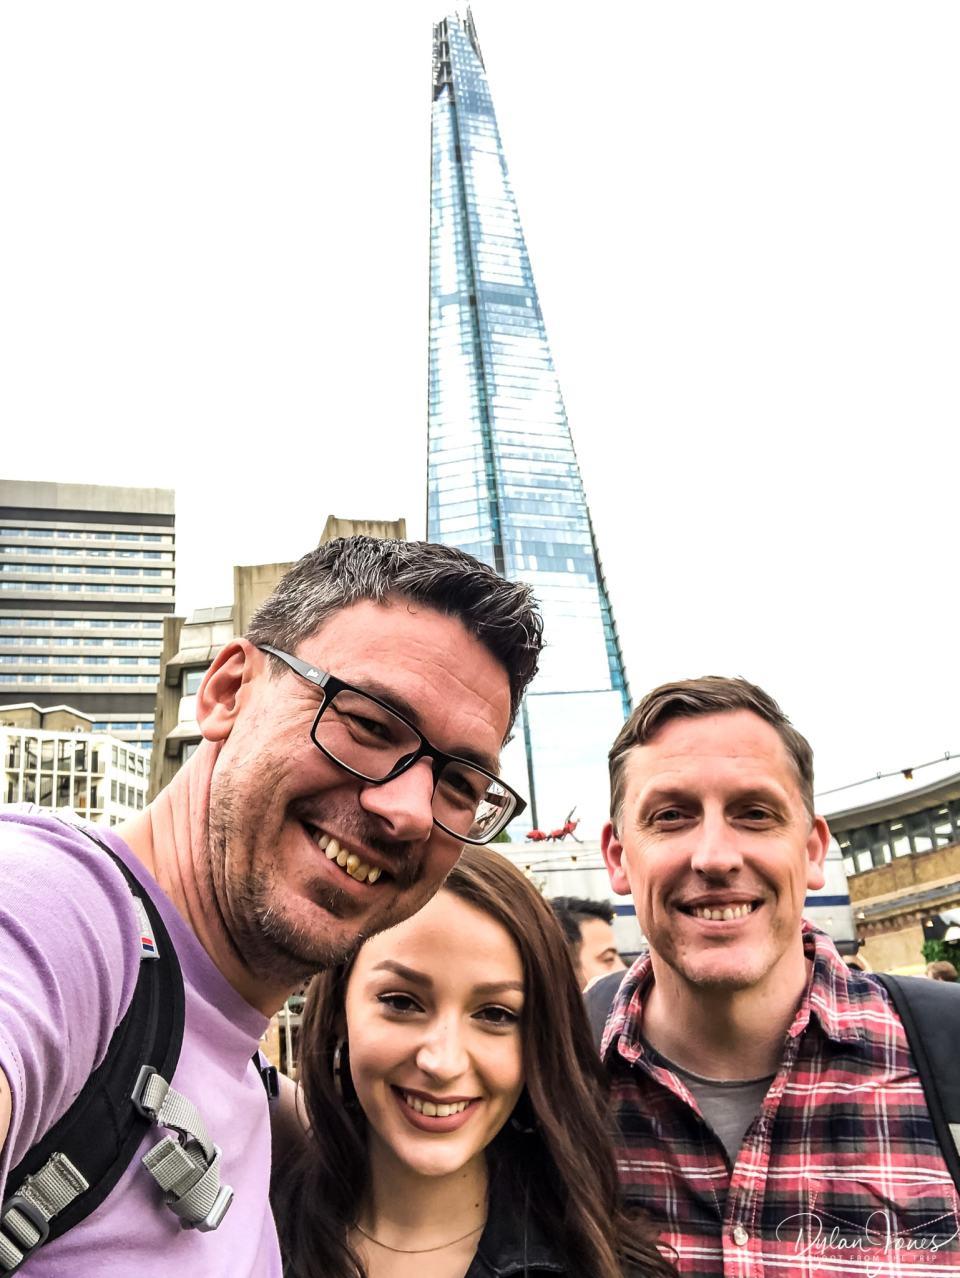 Obligatory Vinegar Yard selfie in front of The Shard